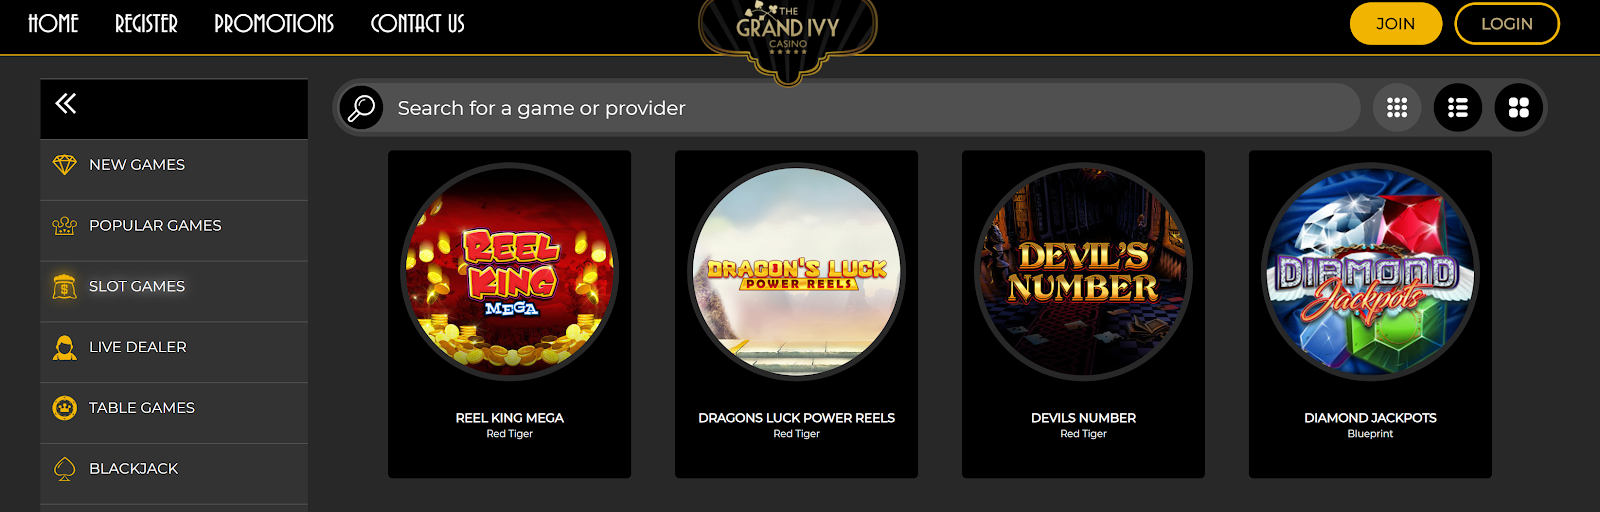 Grand Ivy Casino has one of best slots bonus packages of any UK gambling site